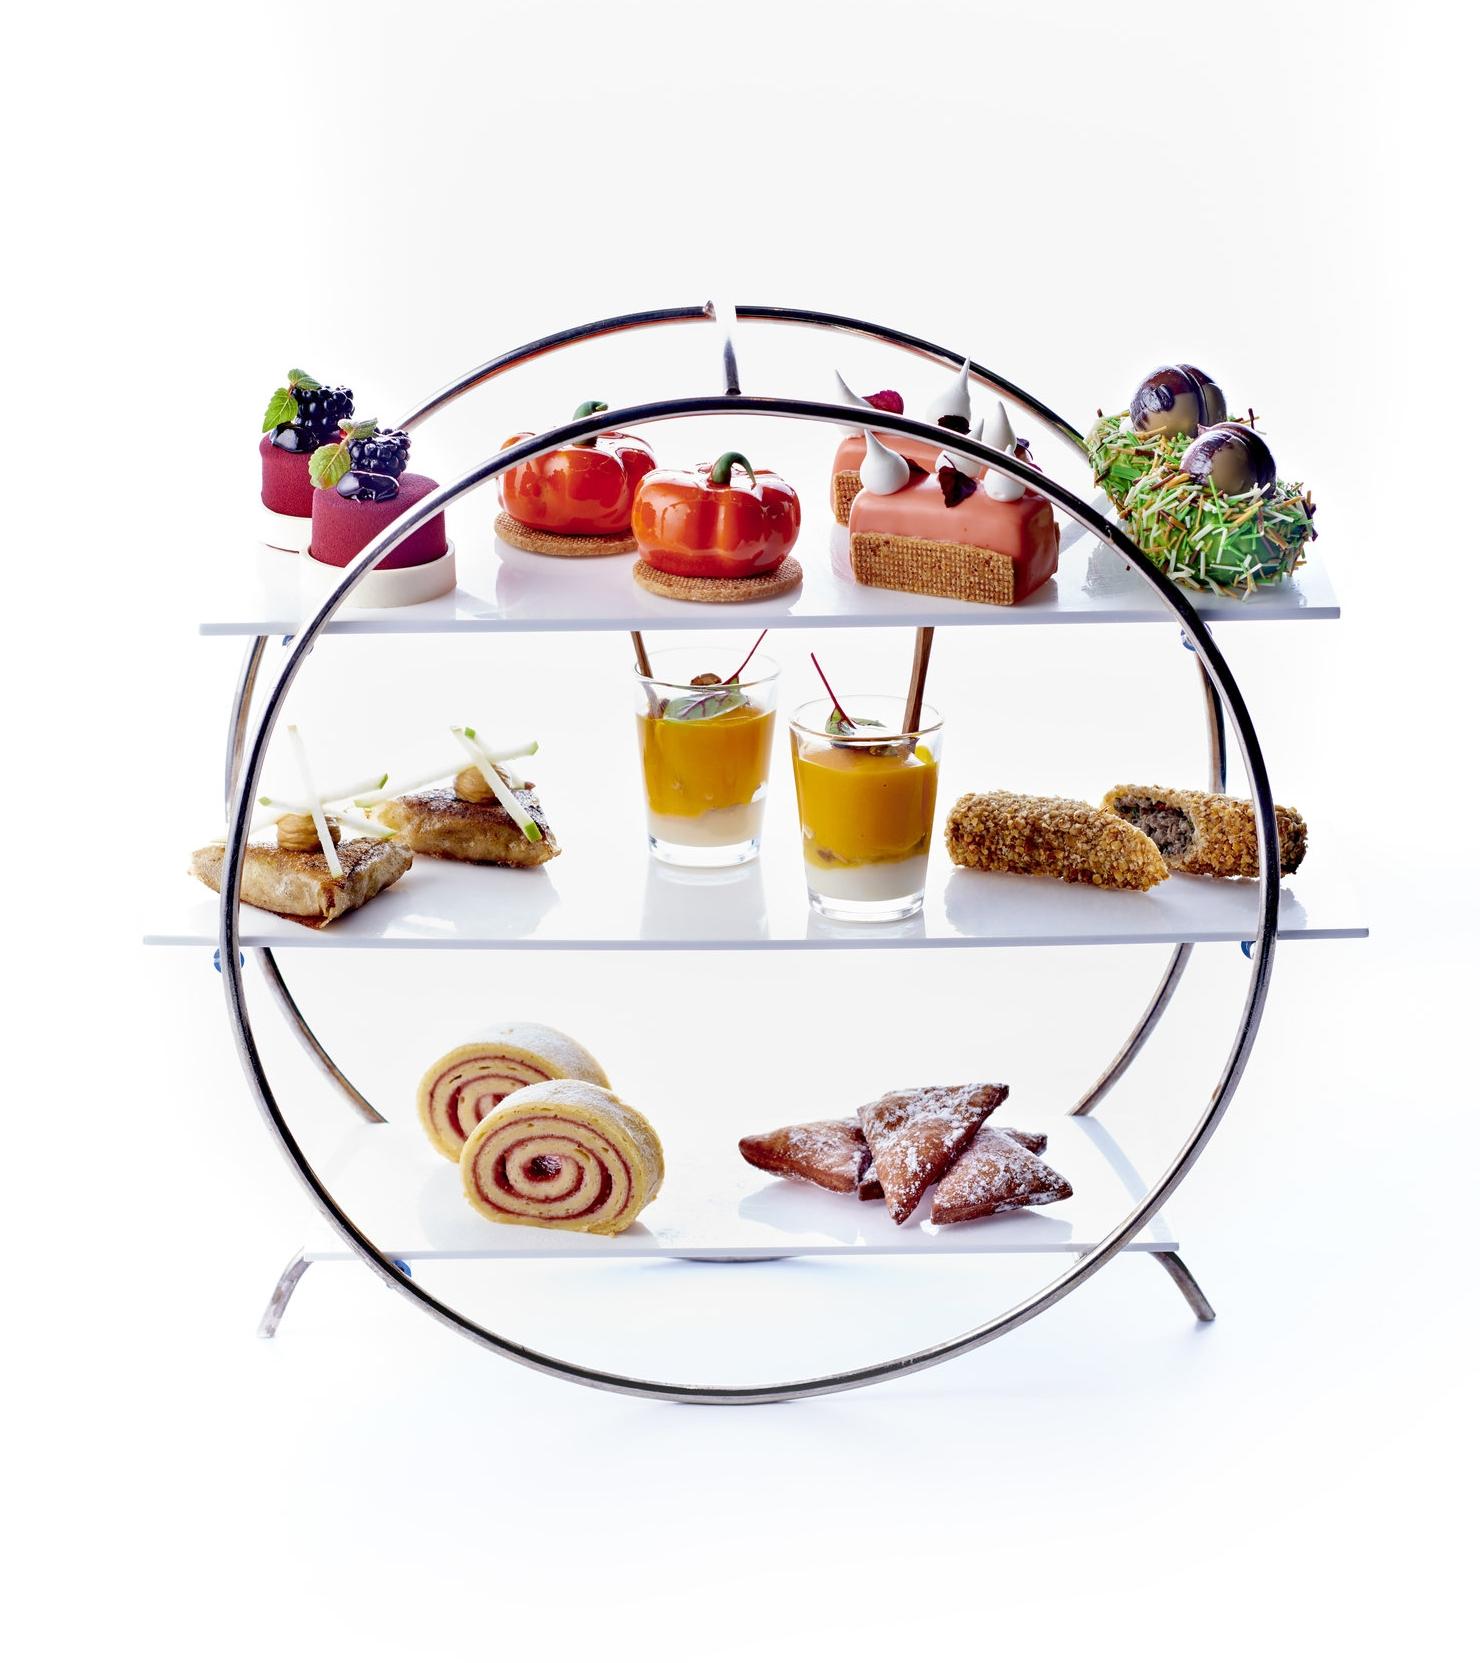 Fall Tea Time by Jimmy Mornet - 5* Hotel Park Hyatt Paris-Vendôme